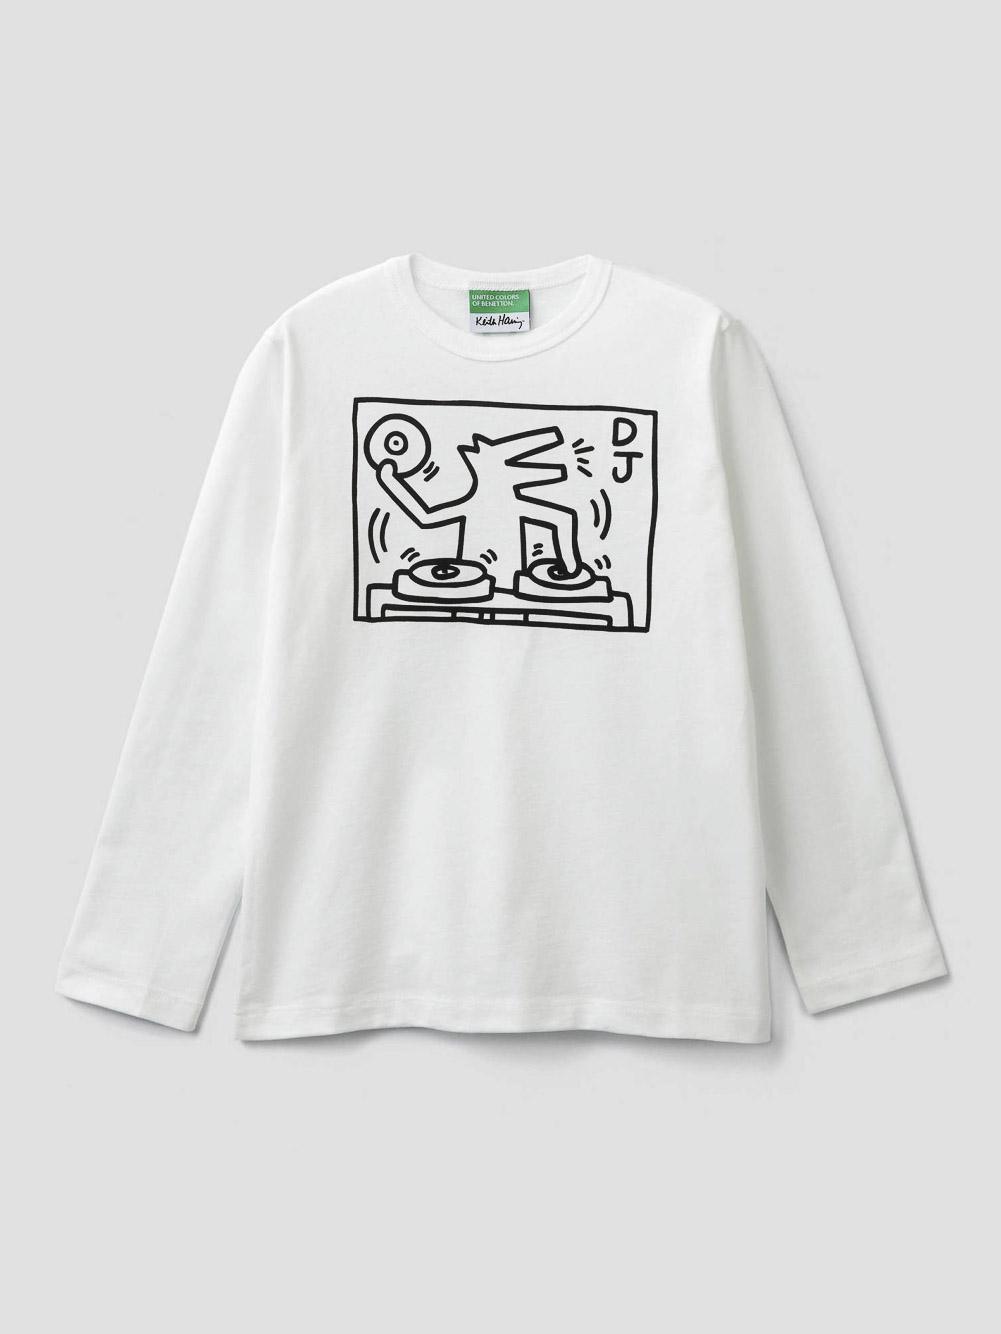 012 BENETTON T-shirt Keith Haring 3096C14U2 20A074